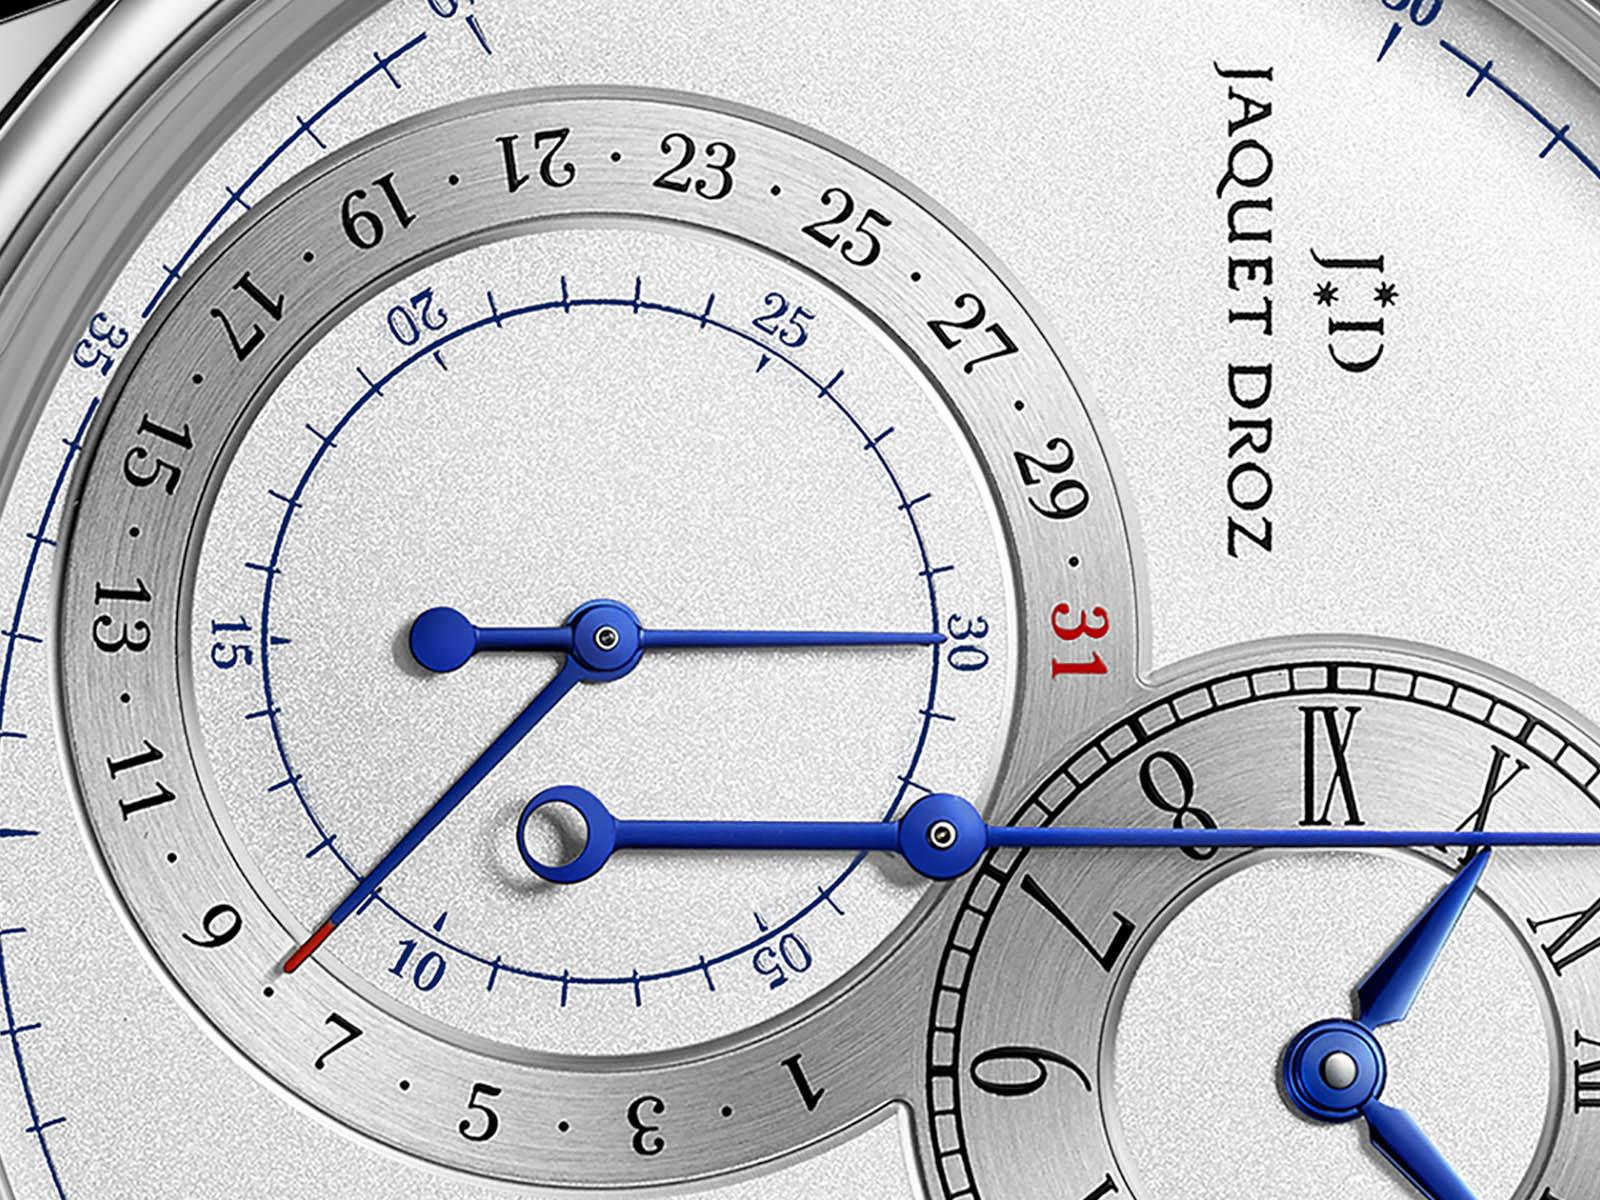 j007830240-jaquet-droz-grande-seconde-chronograph-silver-3.jpg